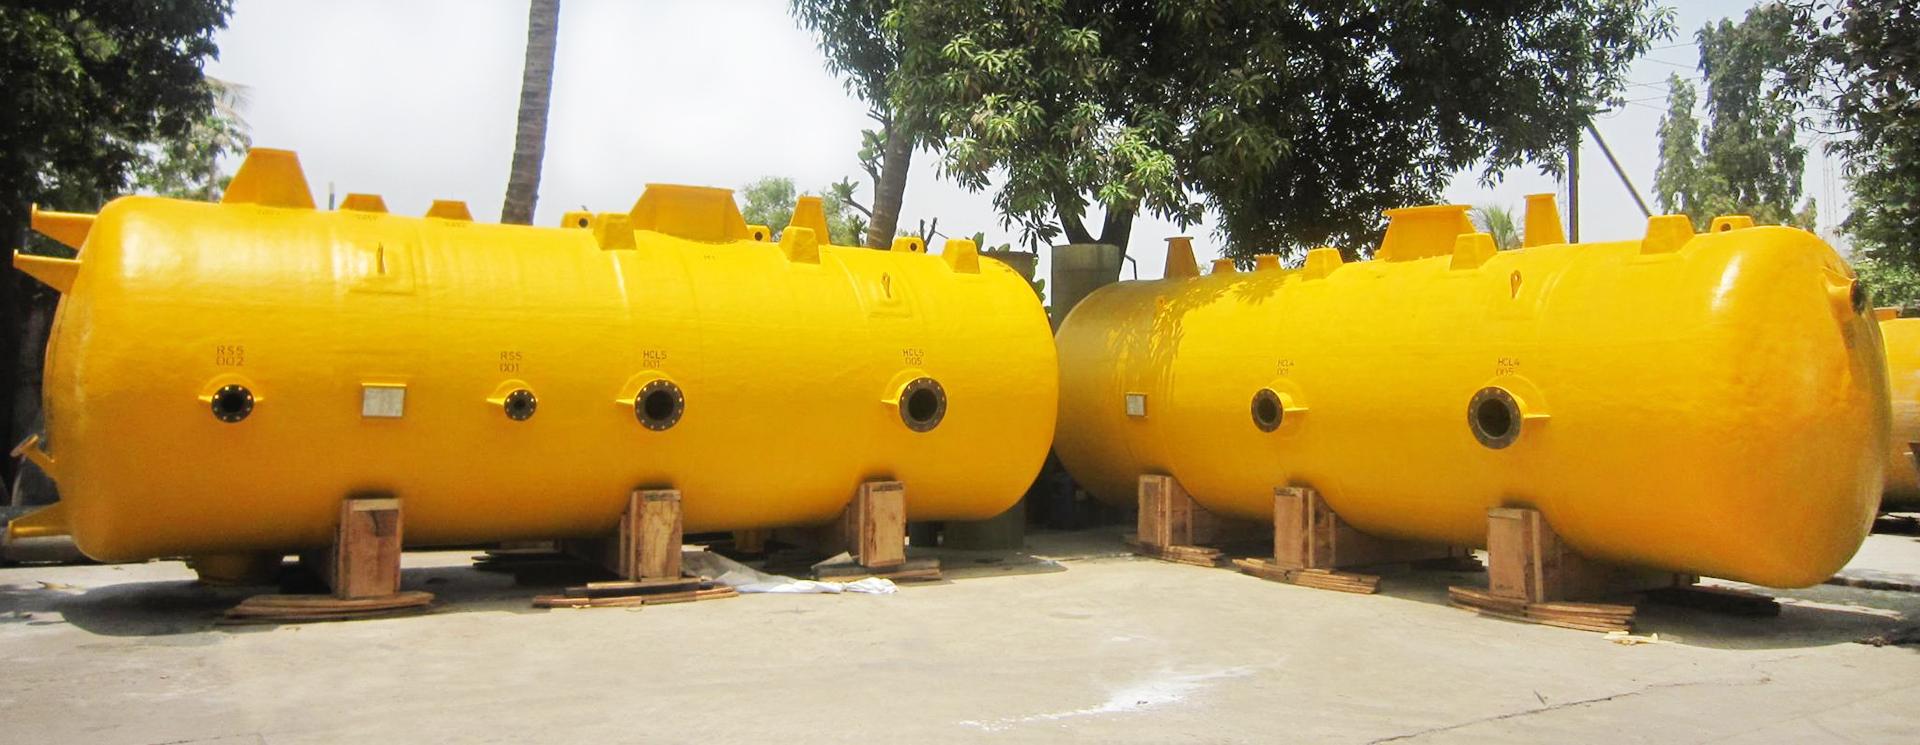 FRP Storage Tanks, Pressure Vessels, Pulp Storage Tanks